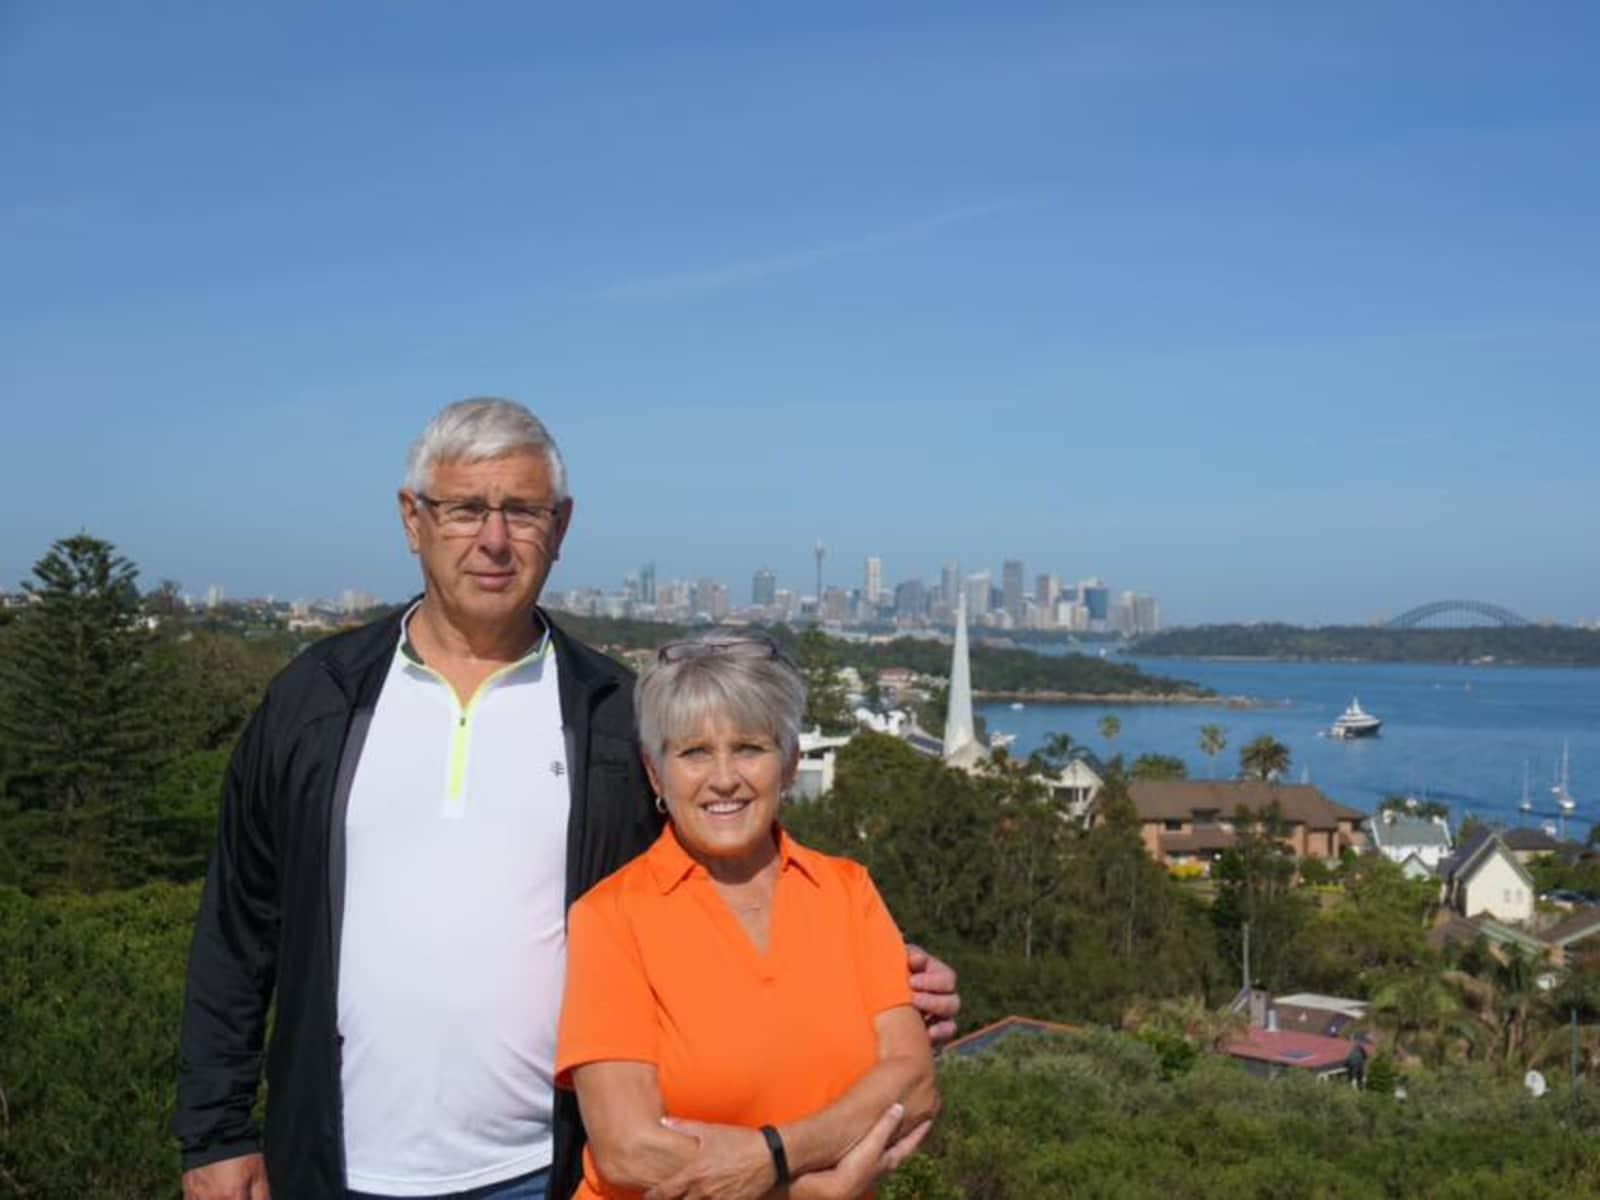 Kristy & Richard from Prior Lake, Minnesota, United States